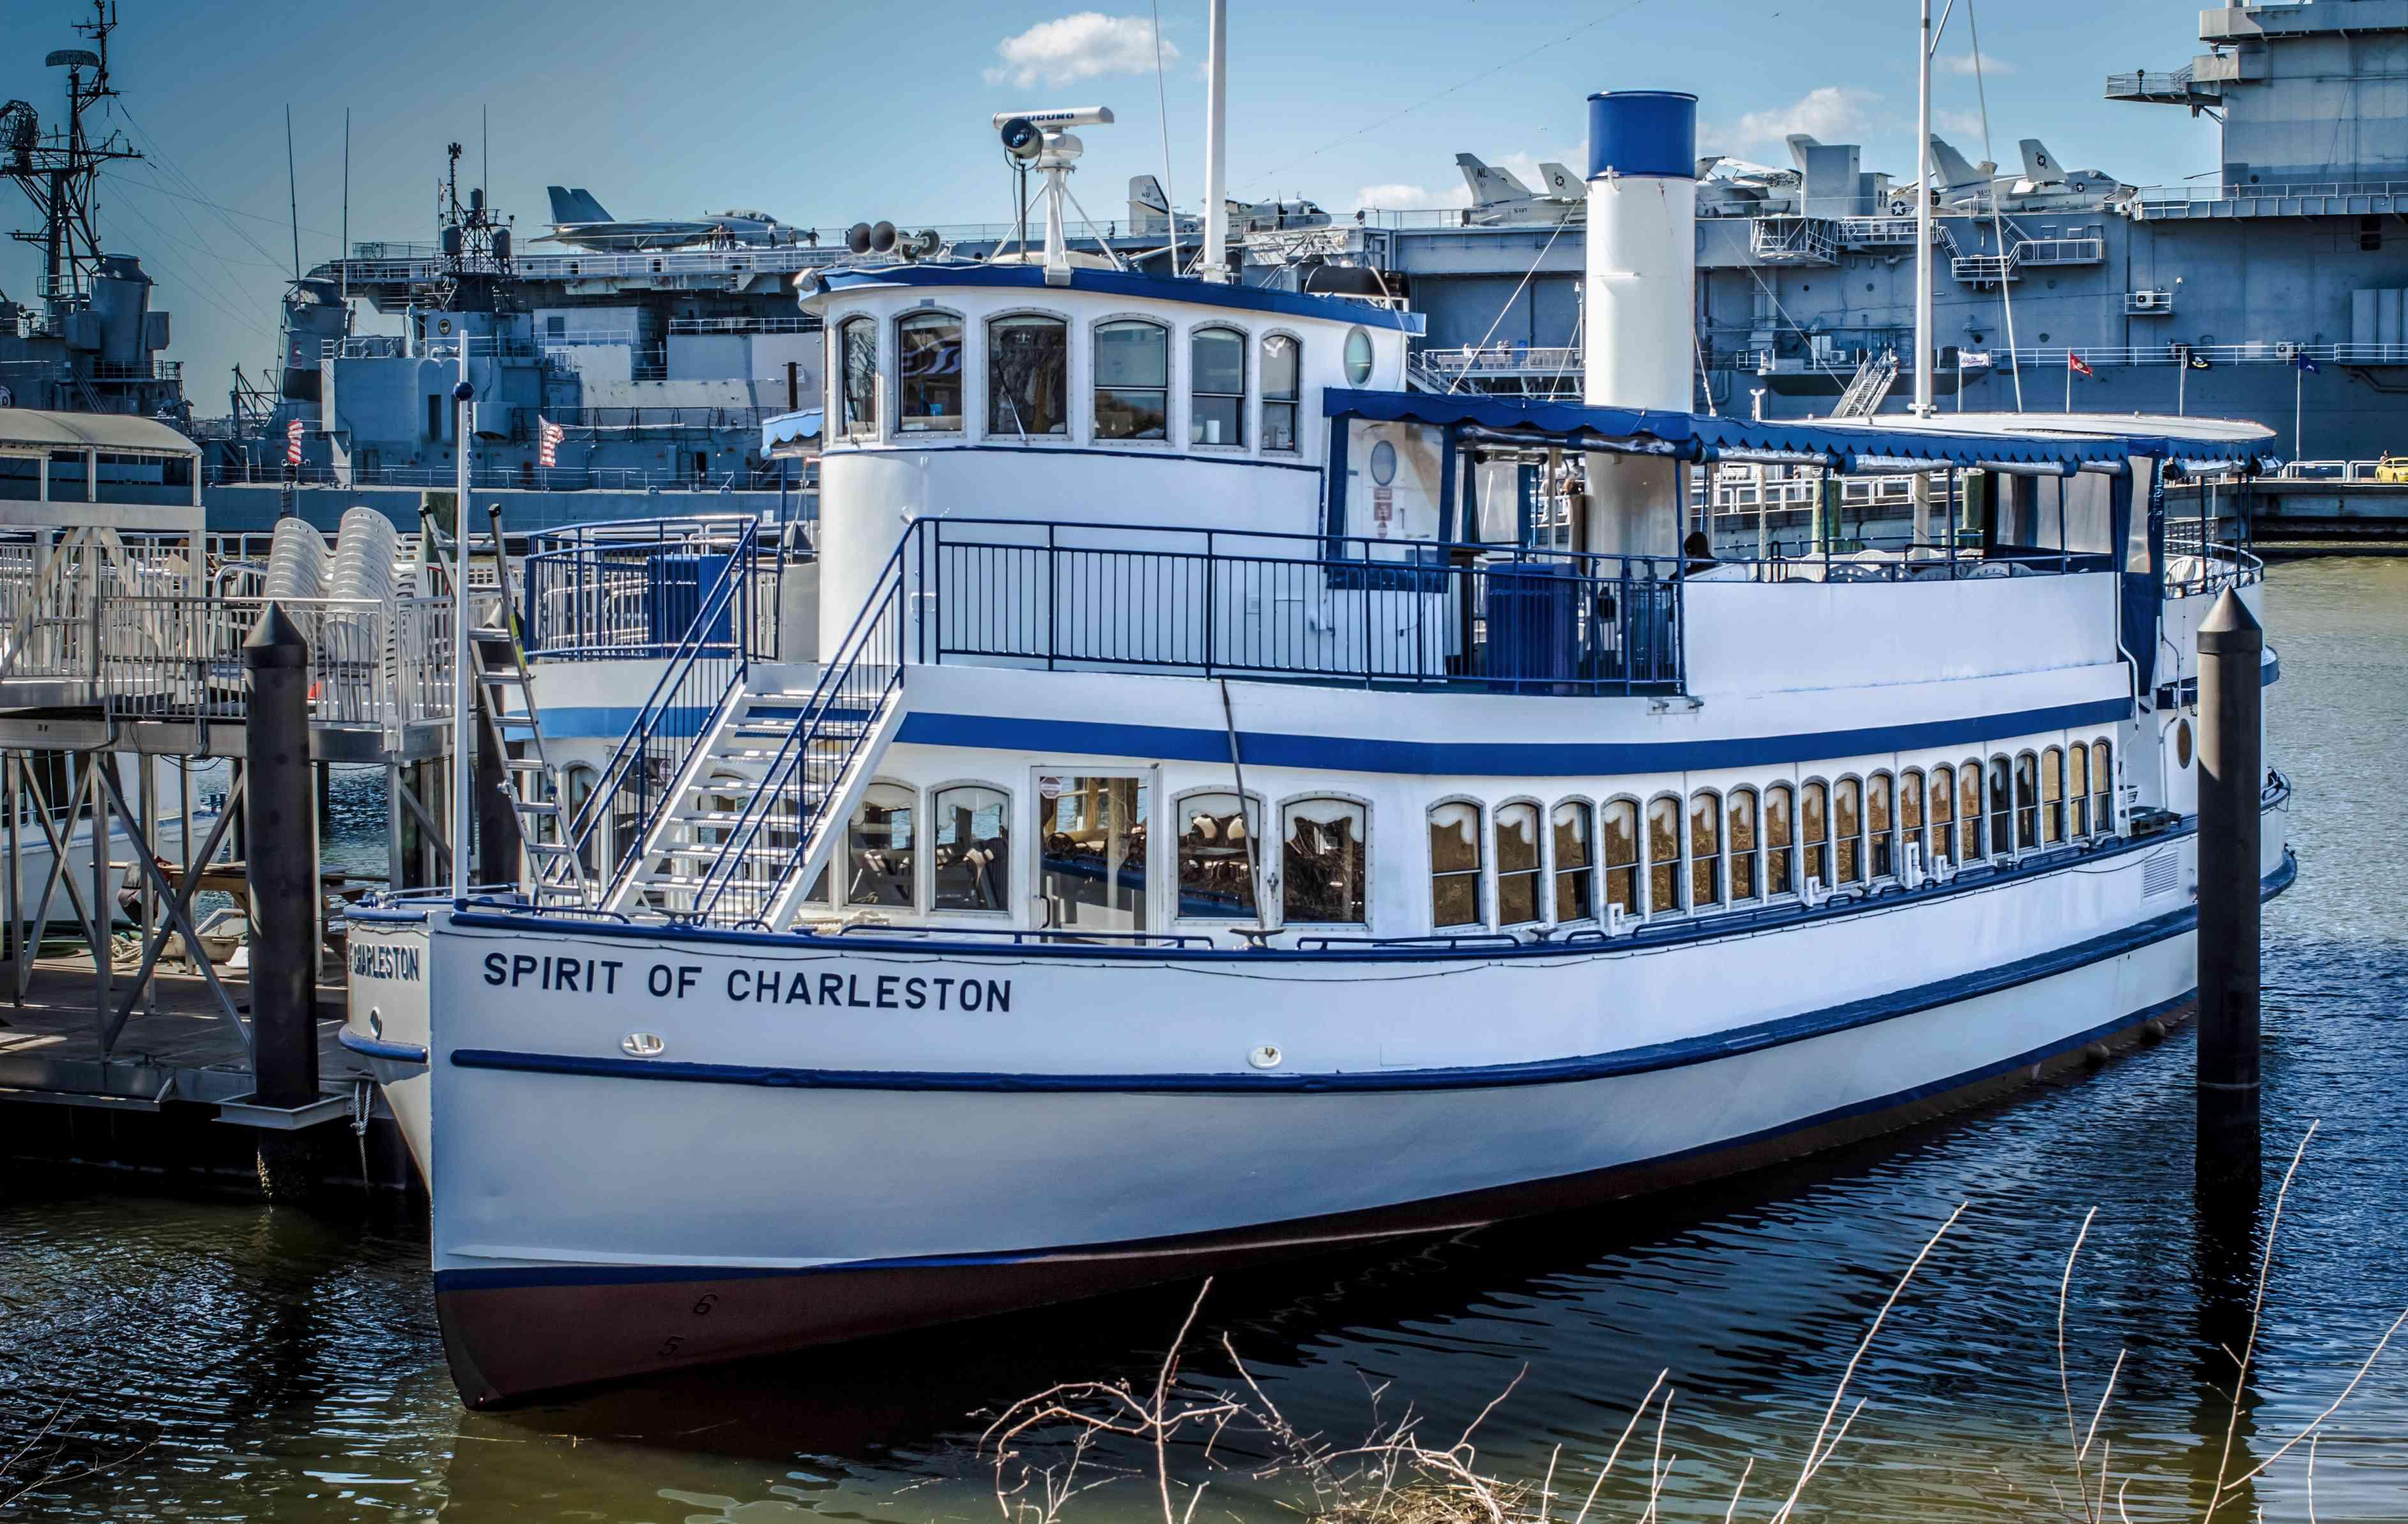 Spirit of Charleston tour boat